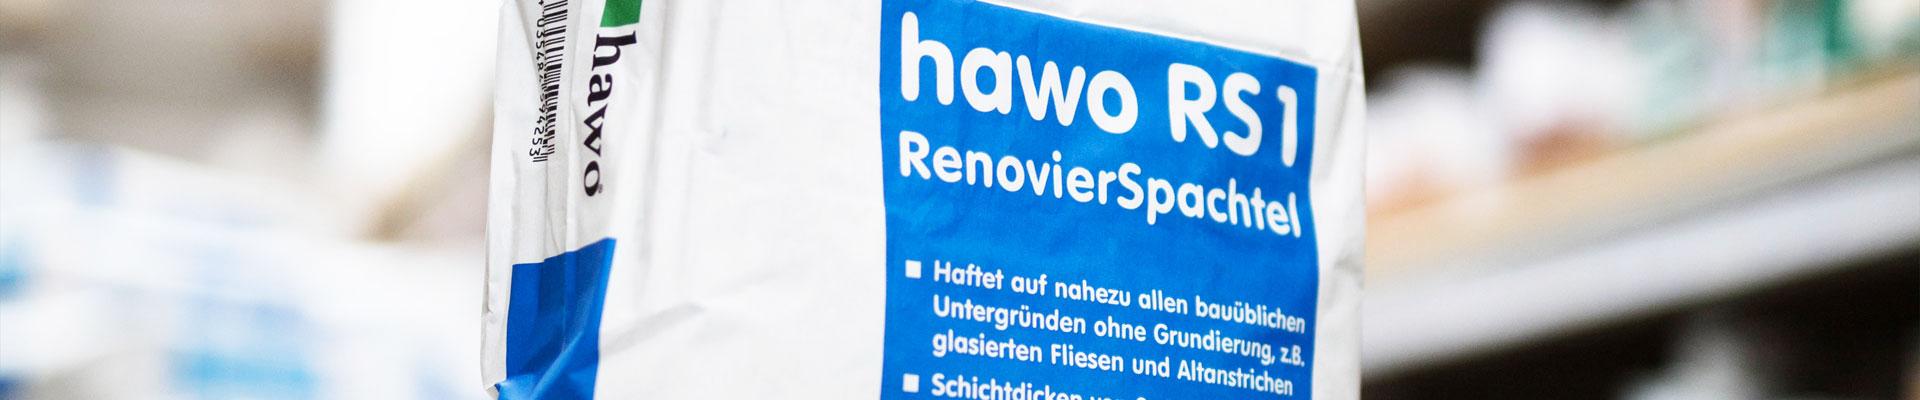 hawo RS1 RenovierSpachtel Banner